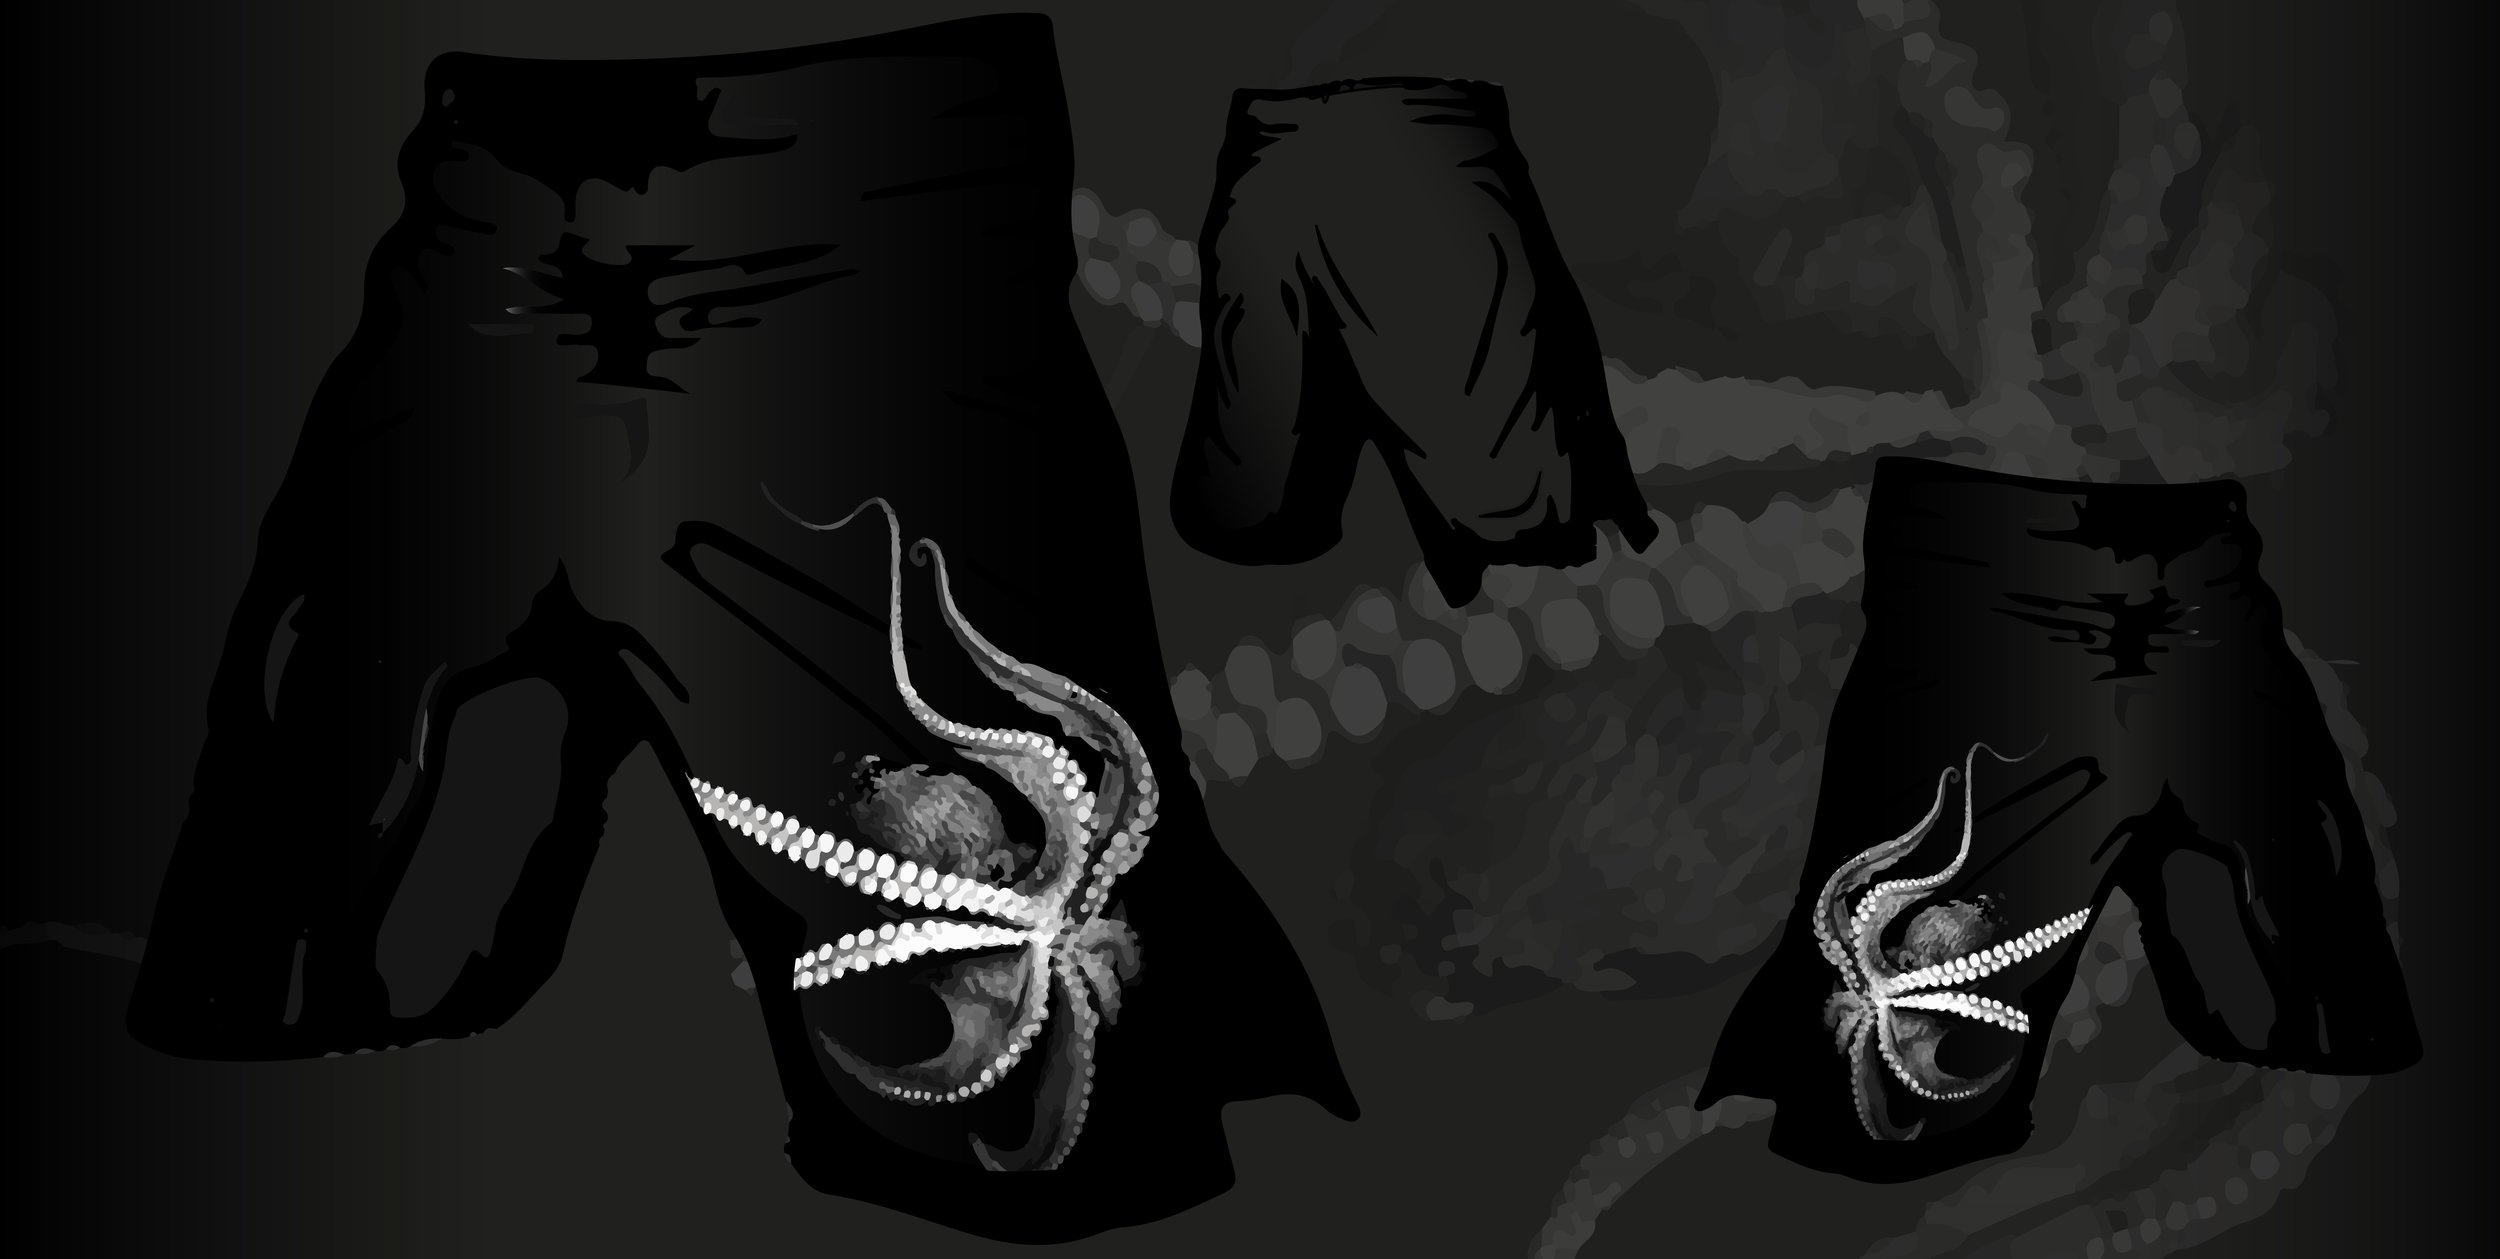 facebook timeline master 2018 black octo long shorts.jpg